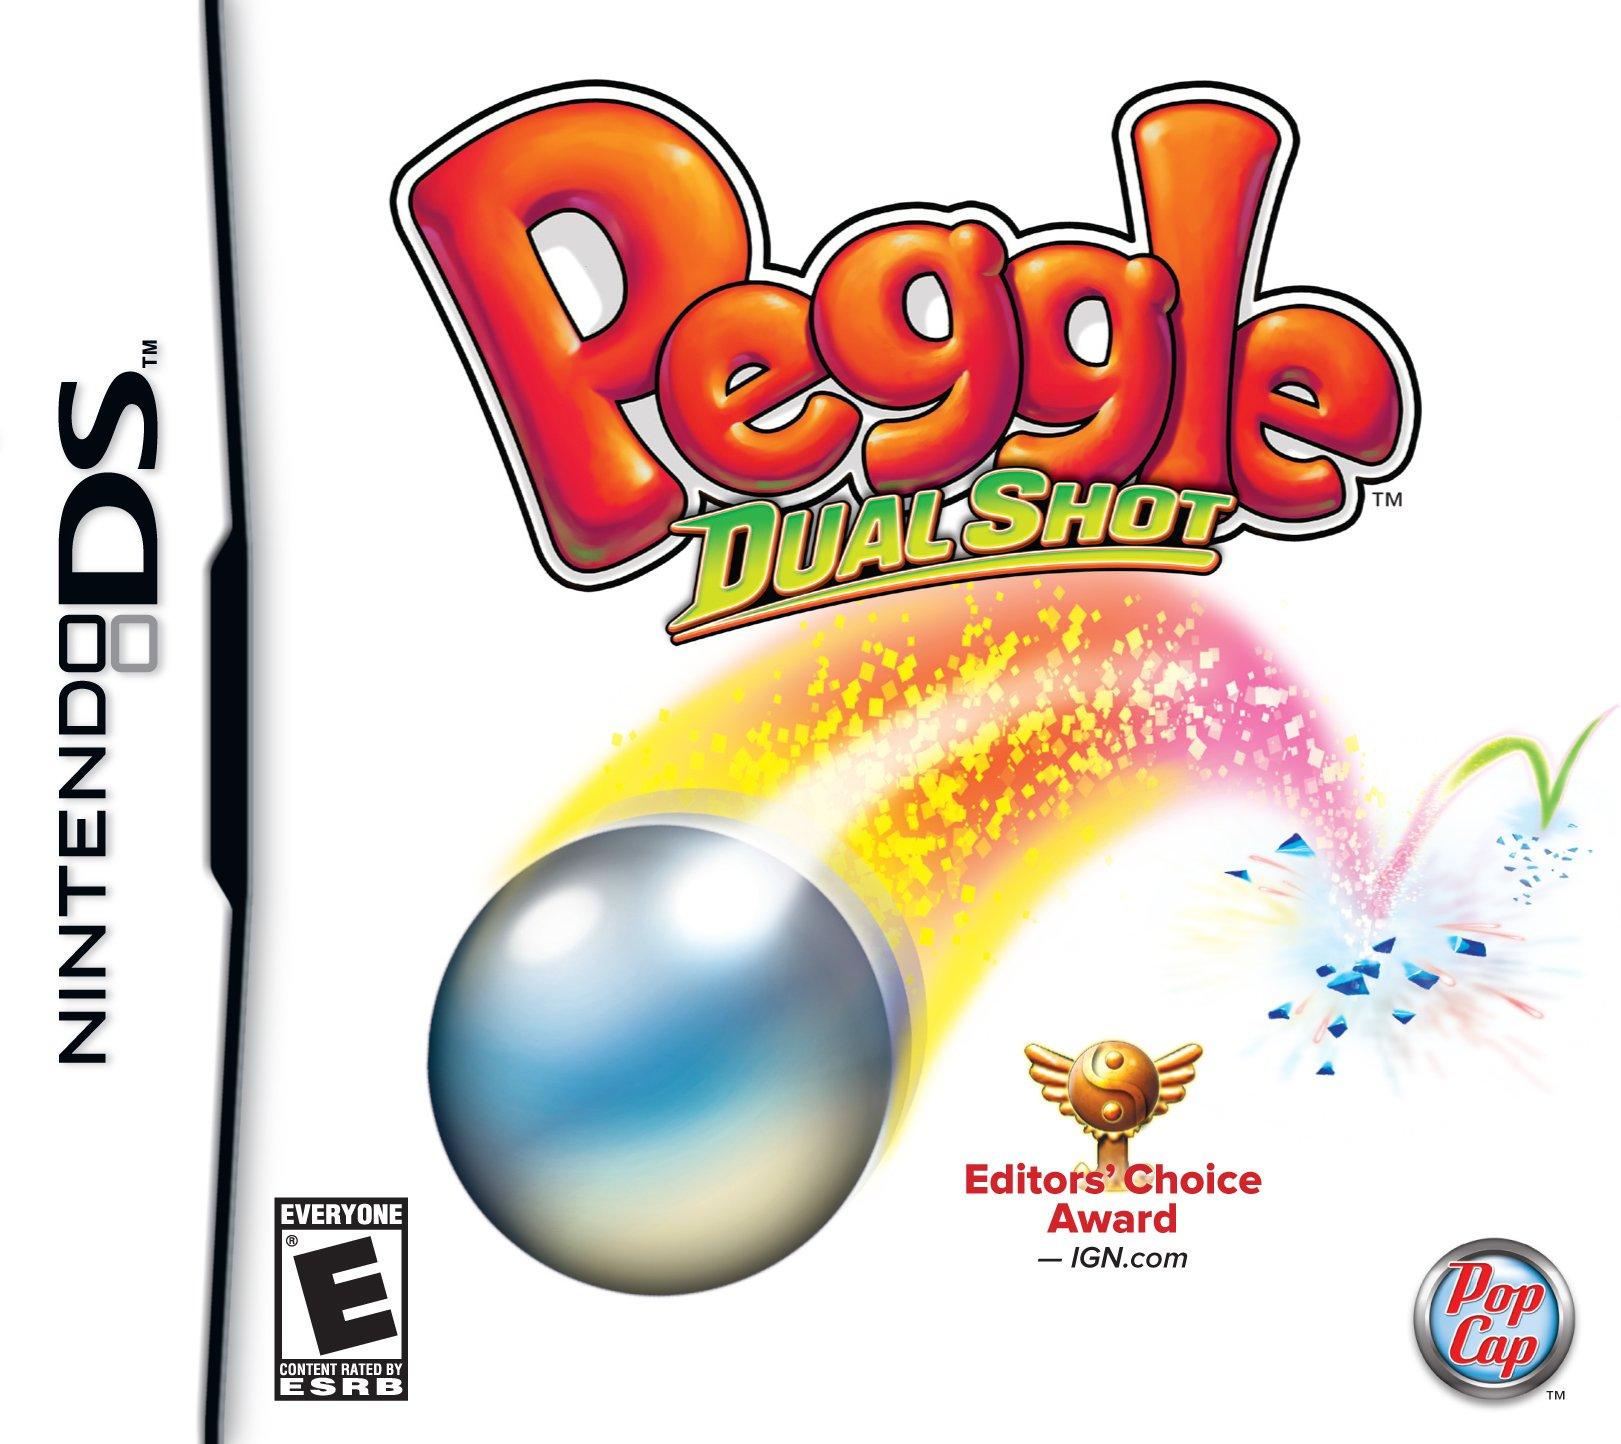 Peggle Dual Shot - Nintendo DS